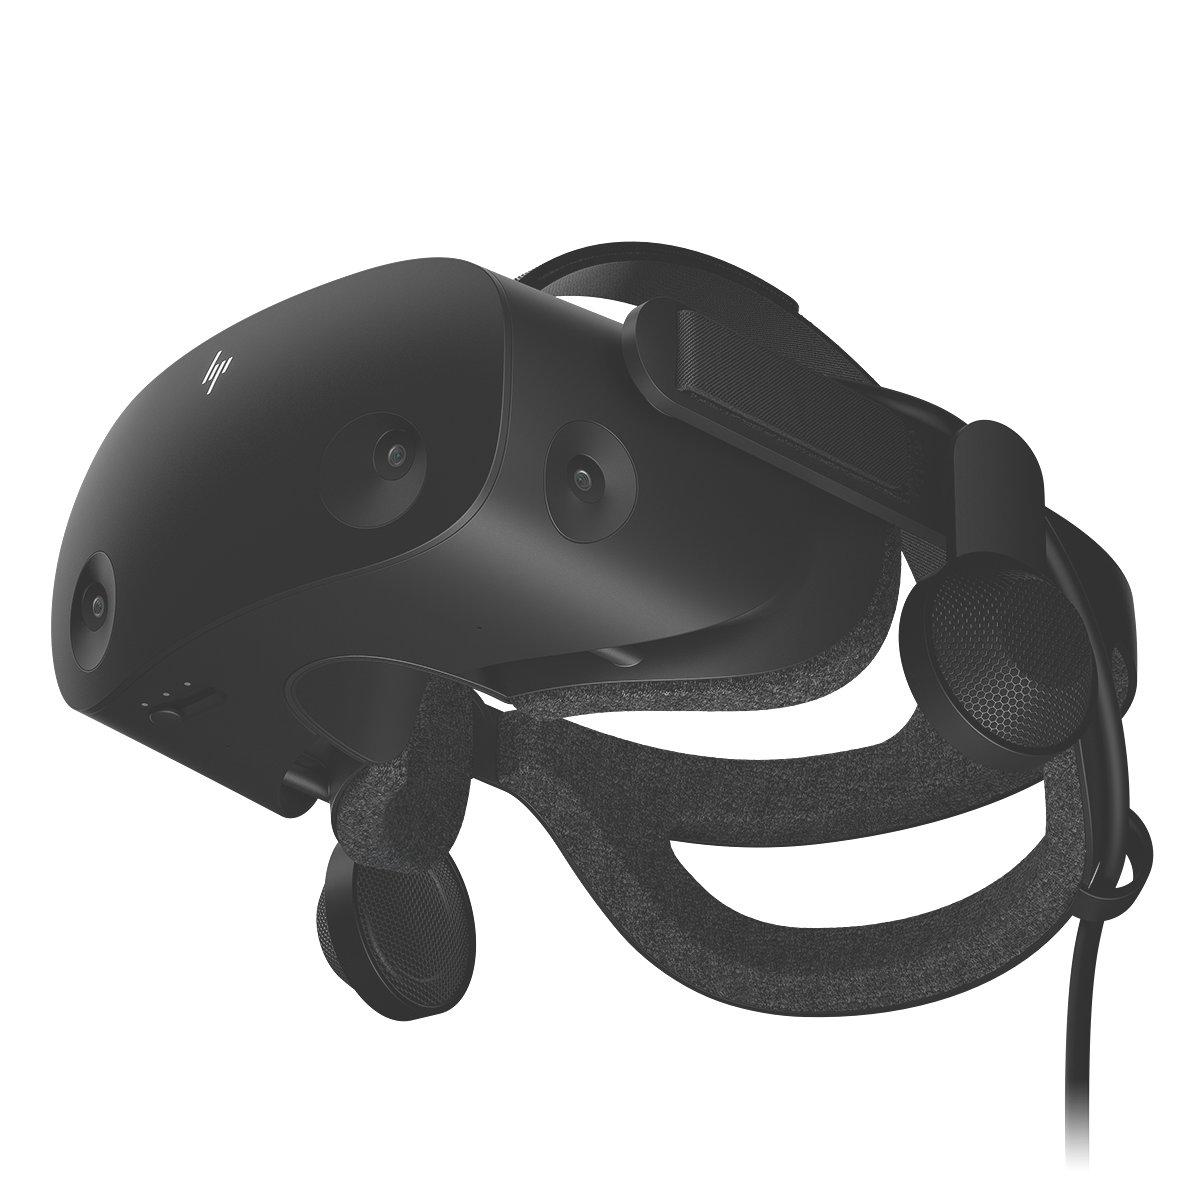 HP Mixed Reality Headset 2020